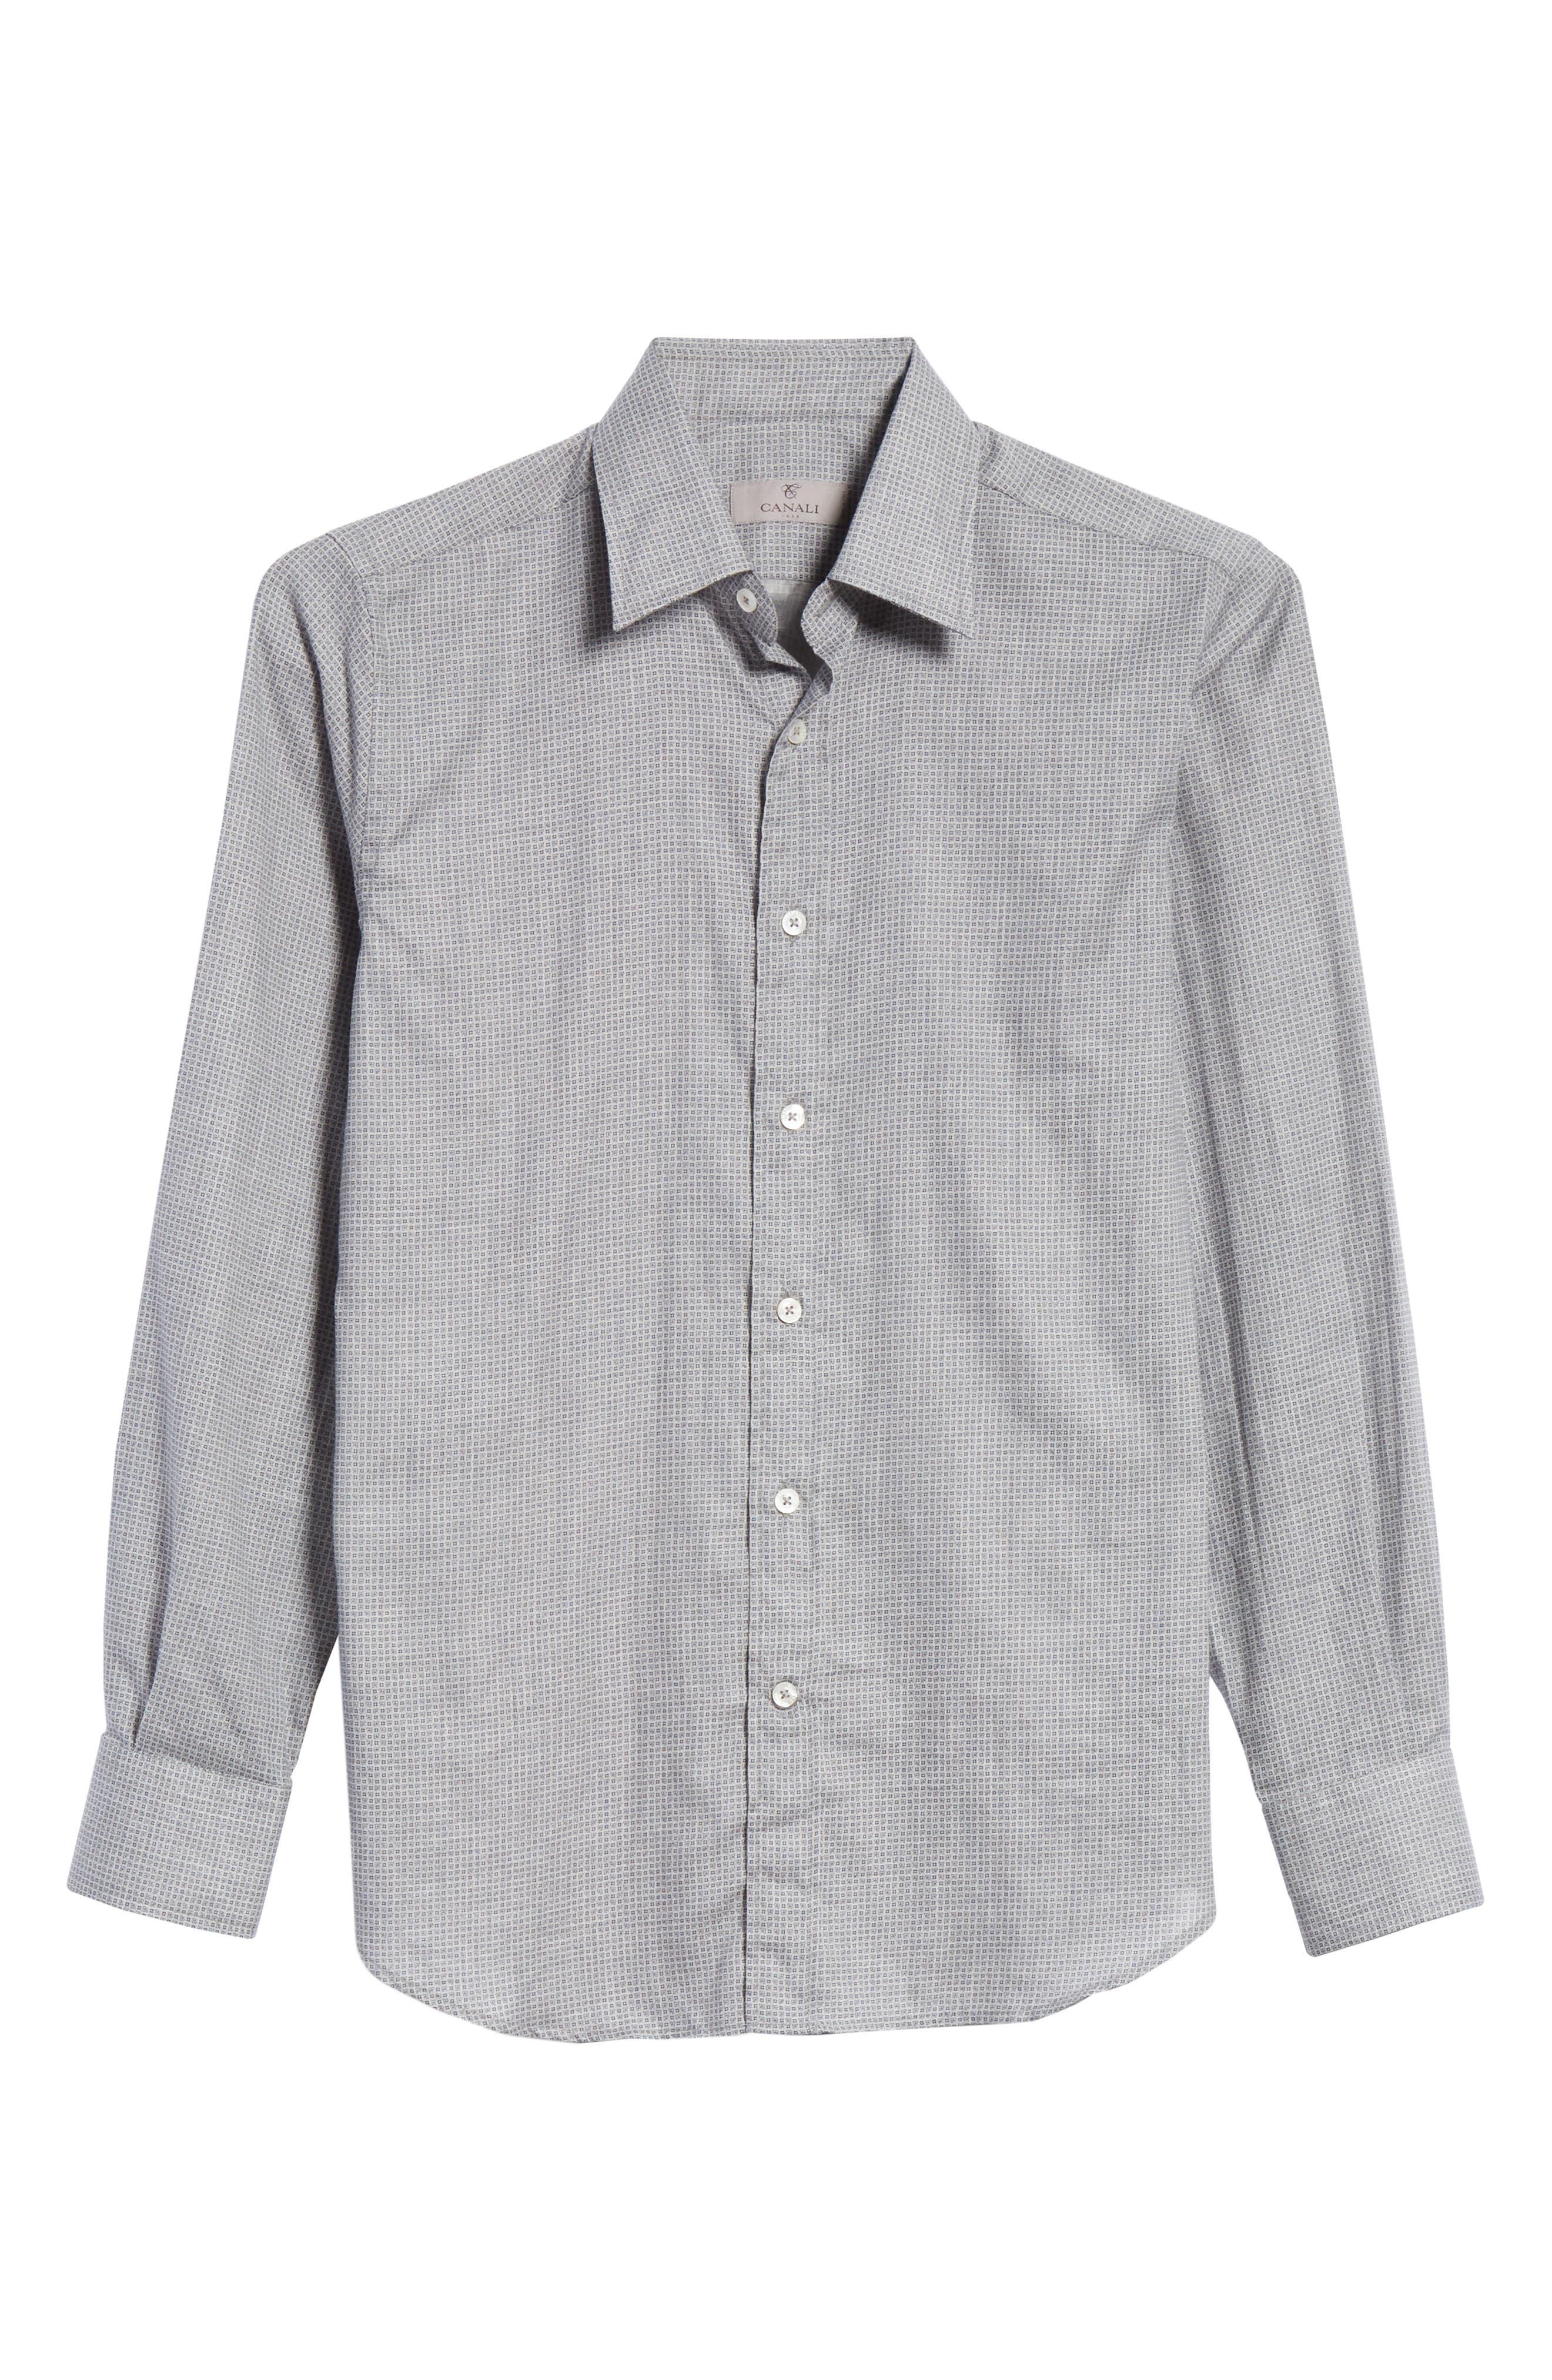 Classic Fit Geometric Dress Shirt,                             Alternate thumbnail 6, color,                             020